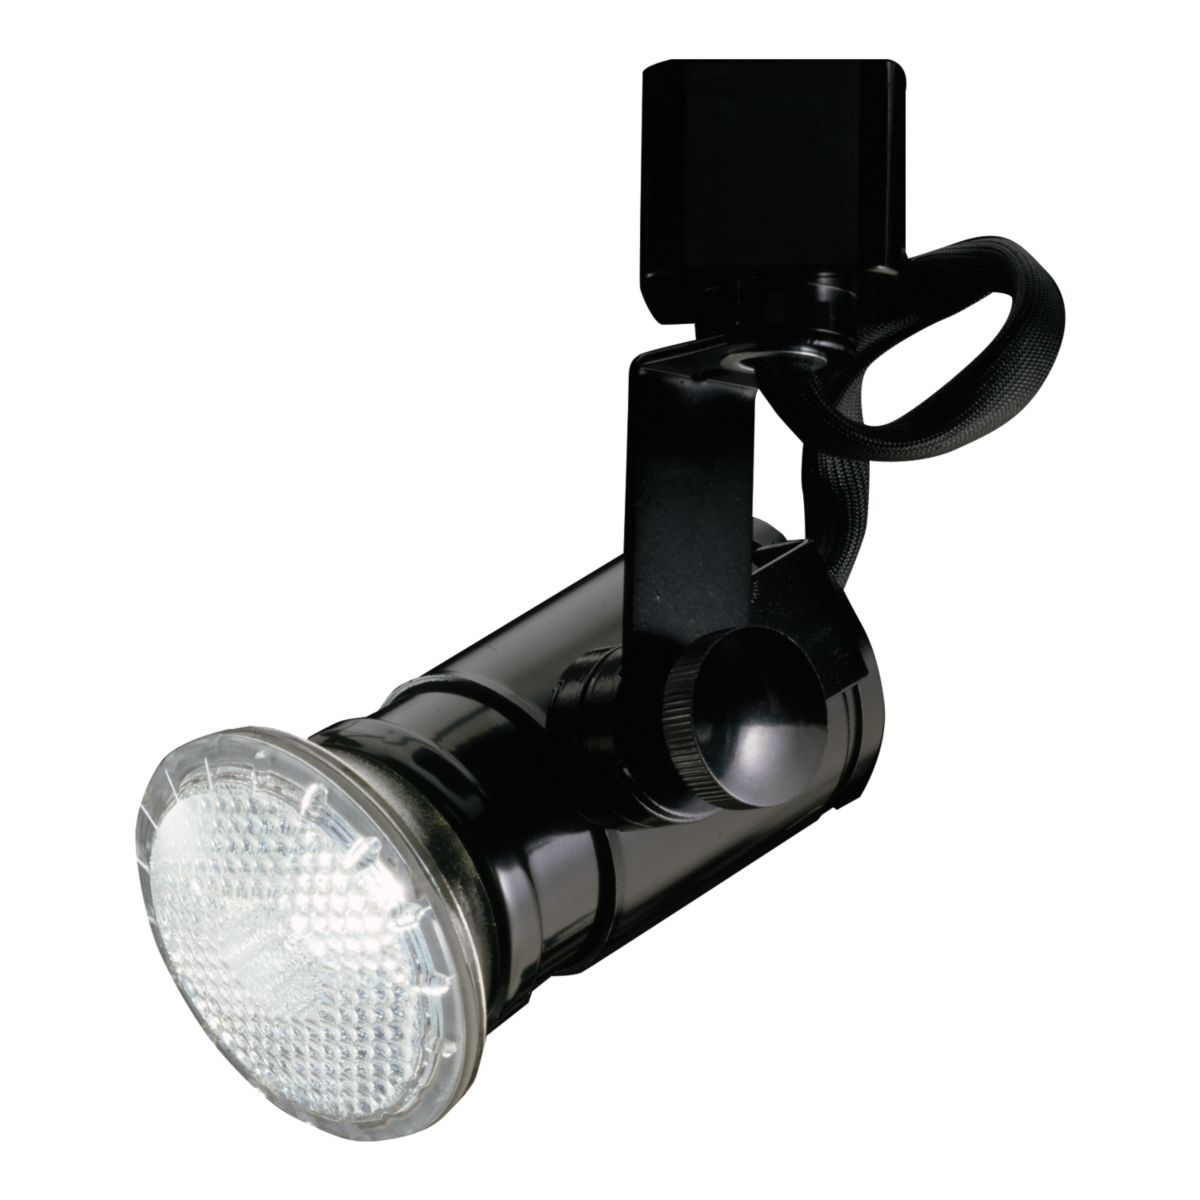 L1735 Universal Lampholder